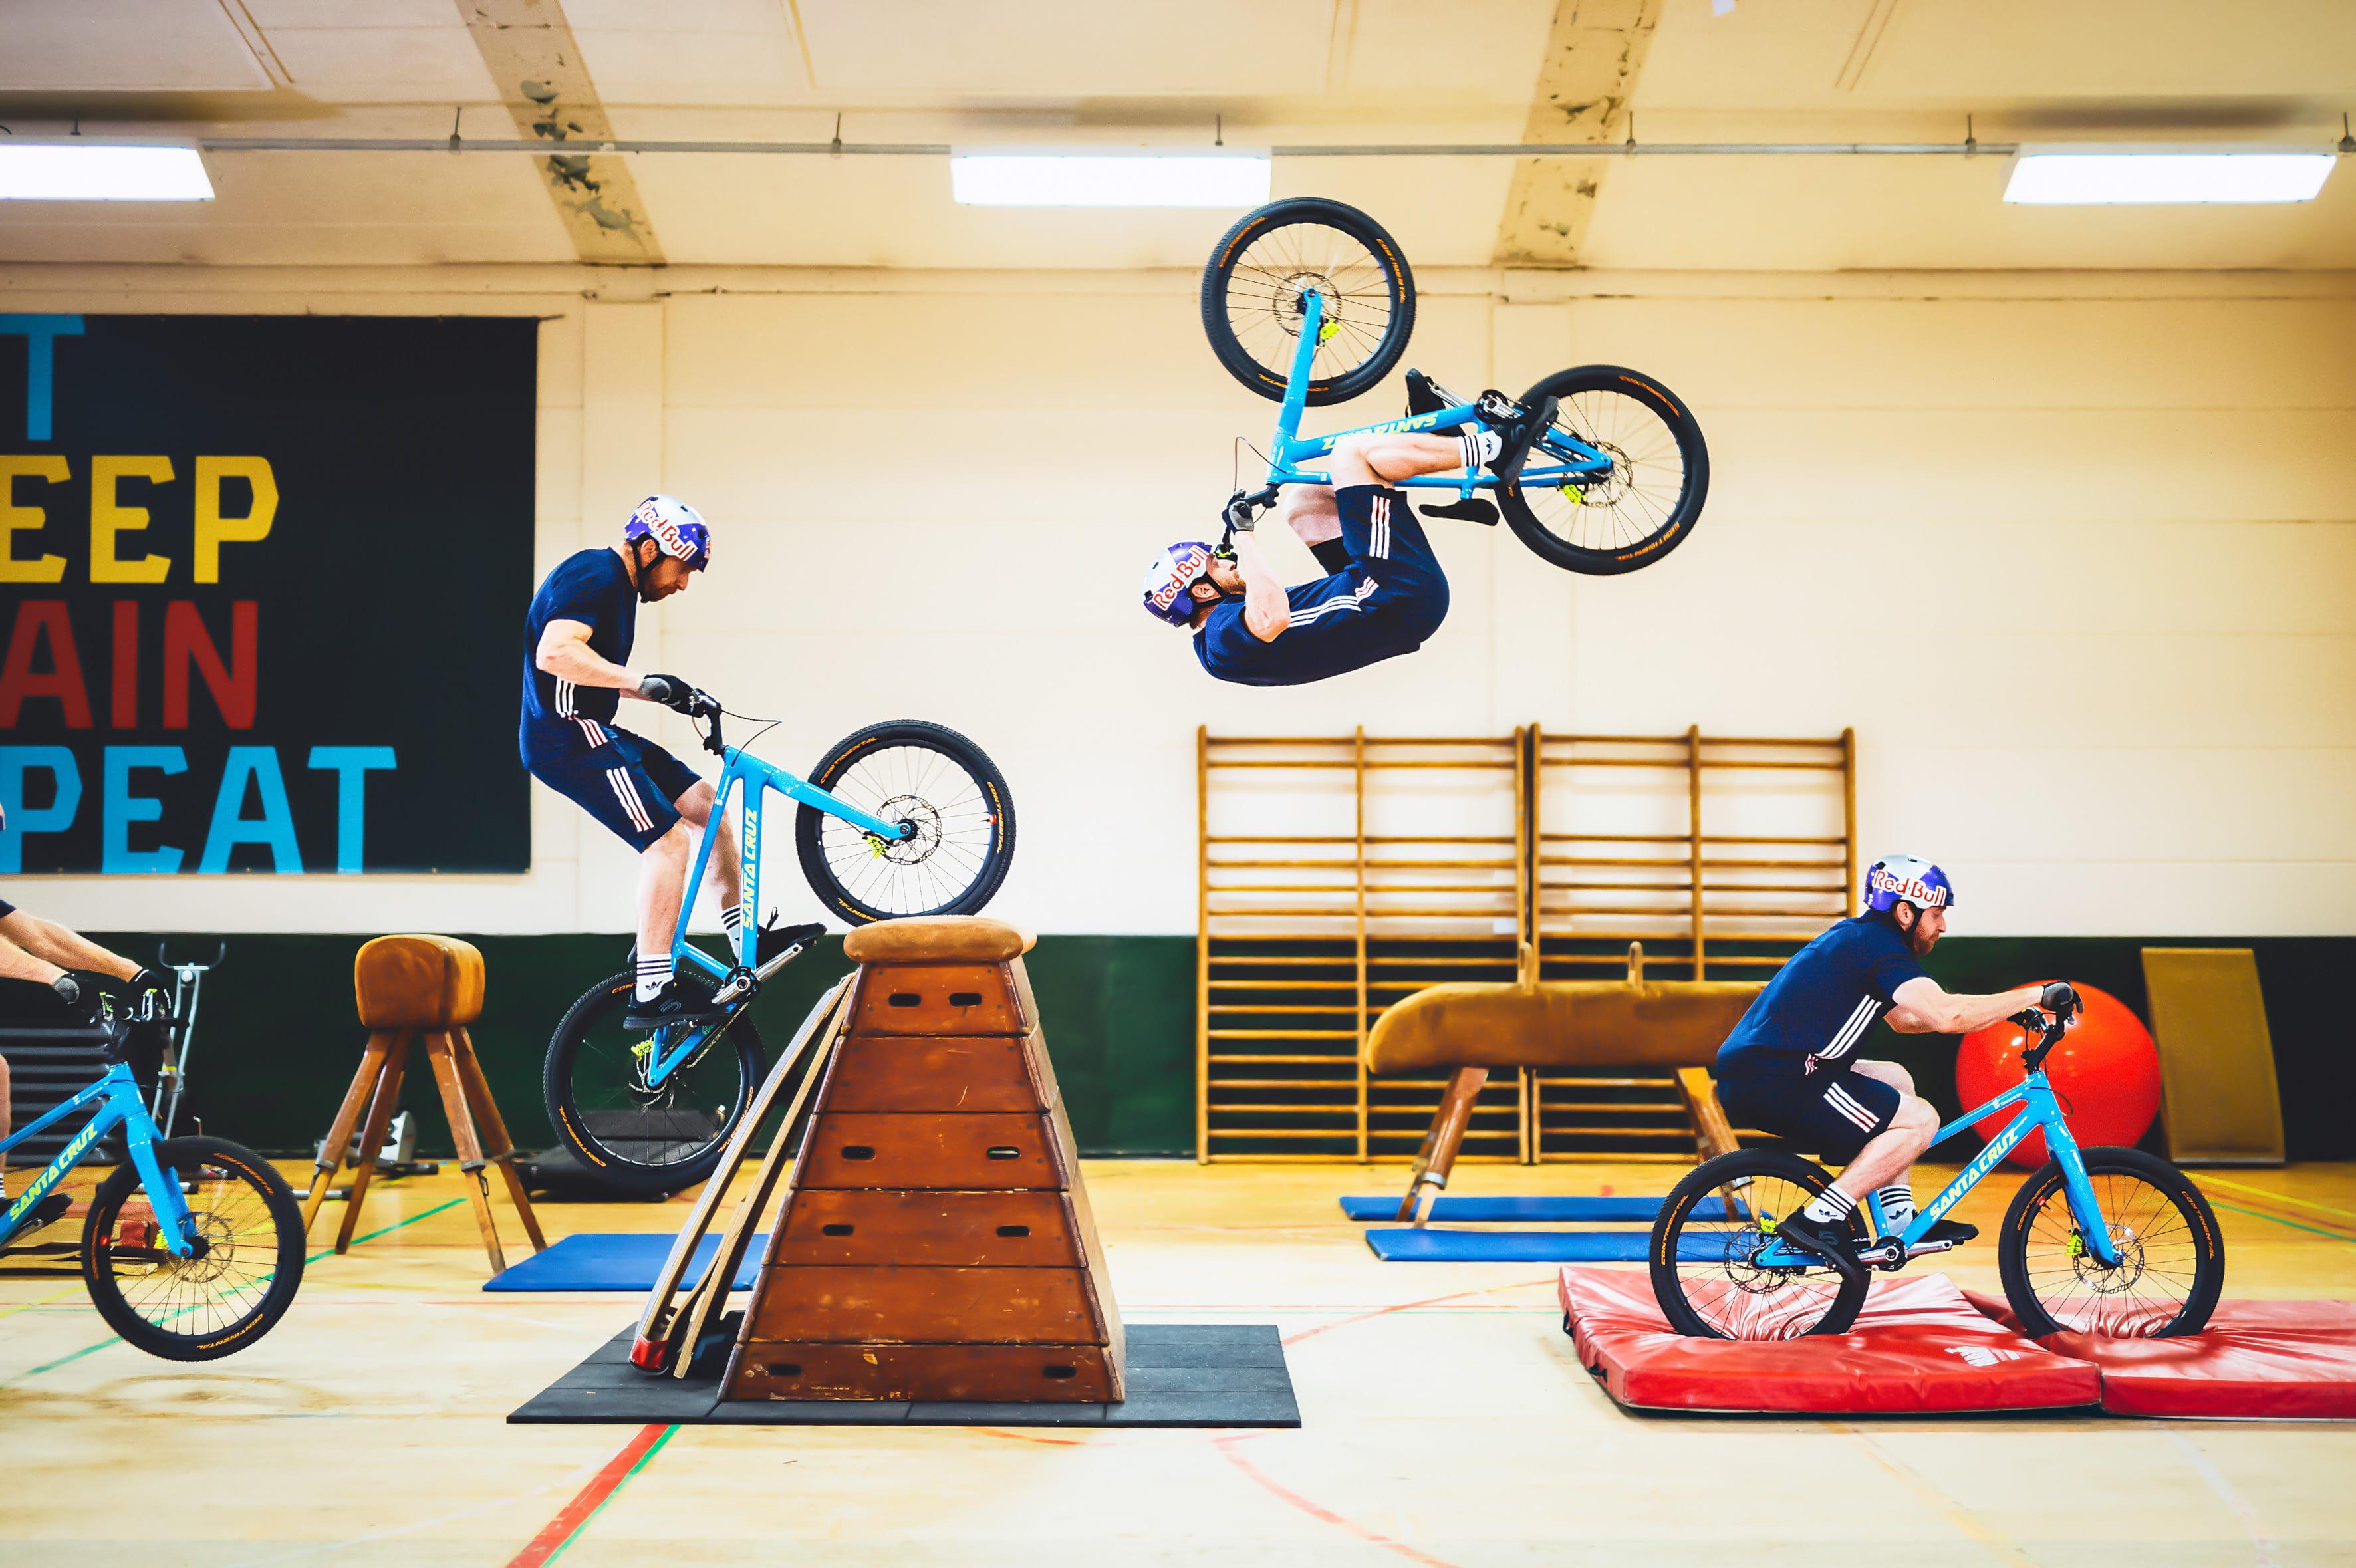 Danny-MacAskill_Gymnasium_-c-_RedBullContentPool_Fred_Murray-11